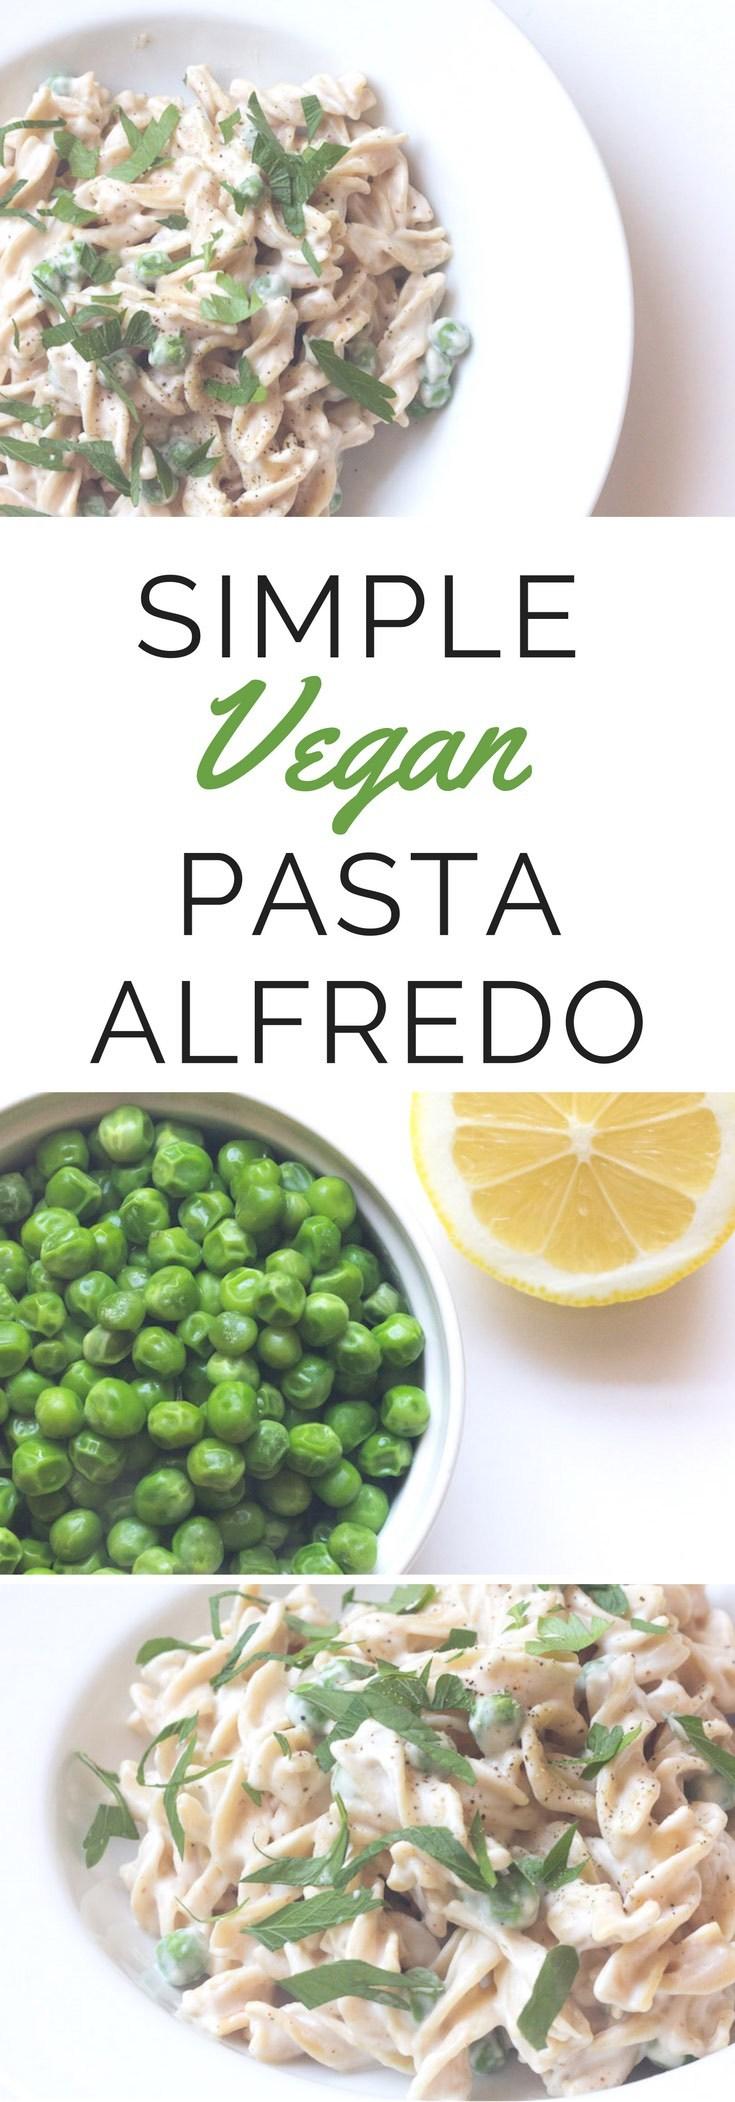 Simple Vegan Pasta Alfredo